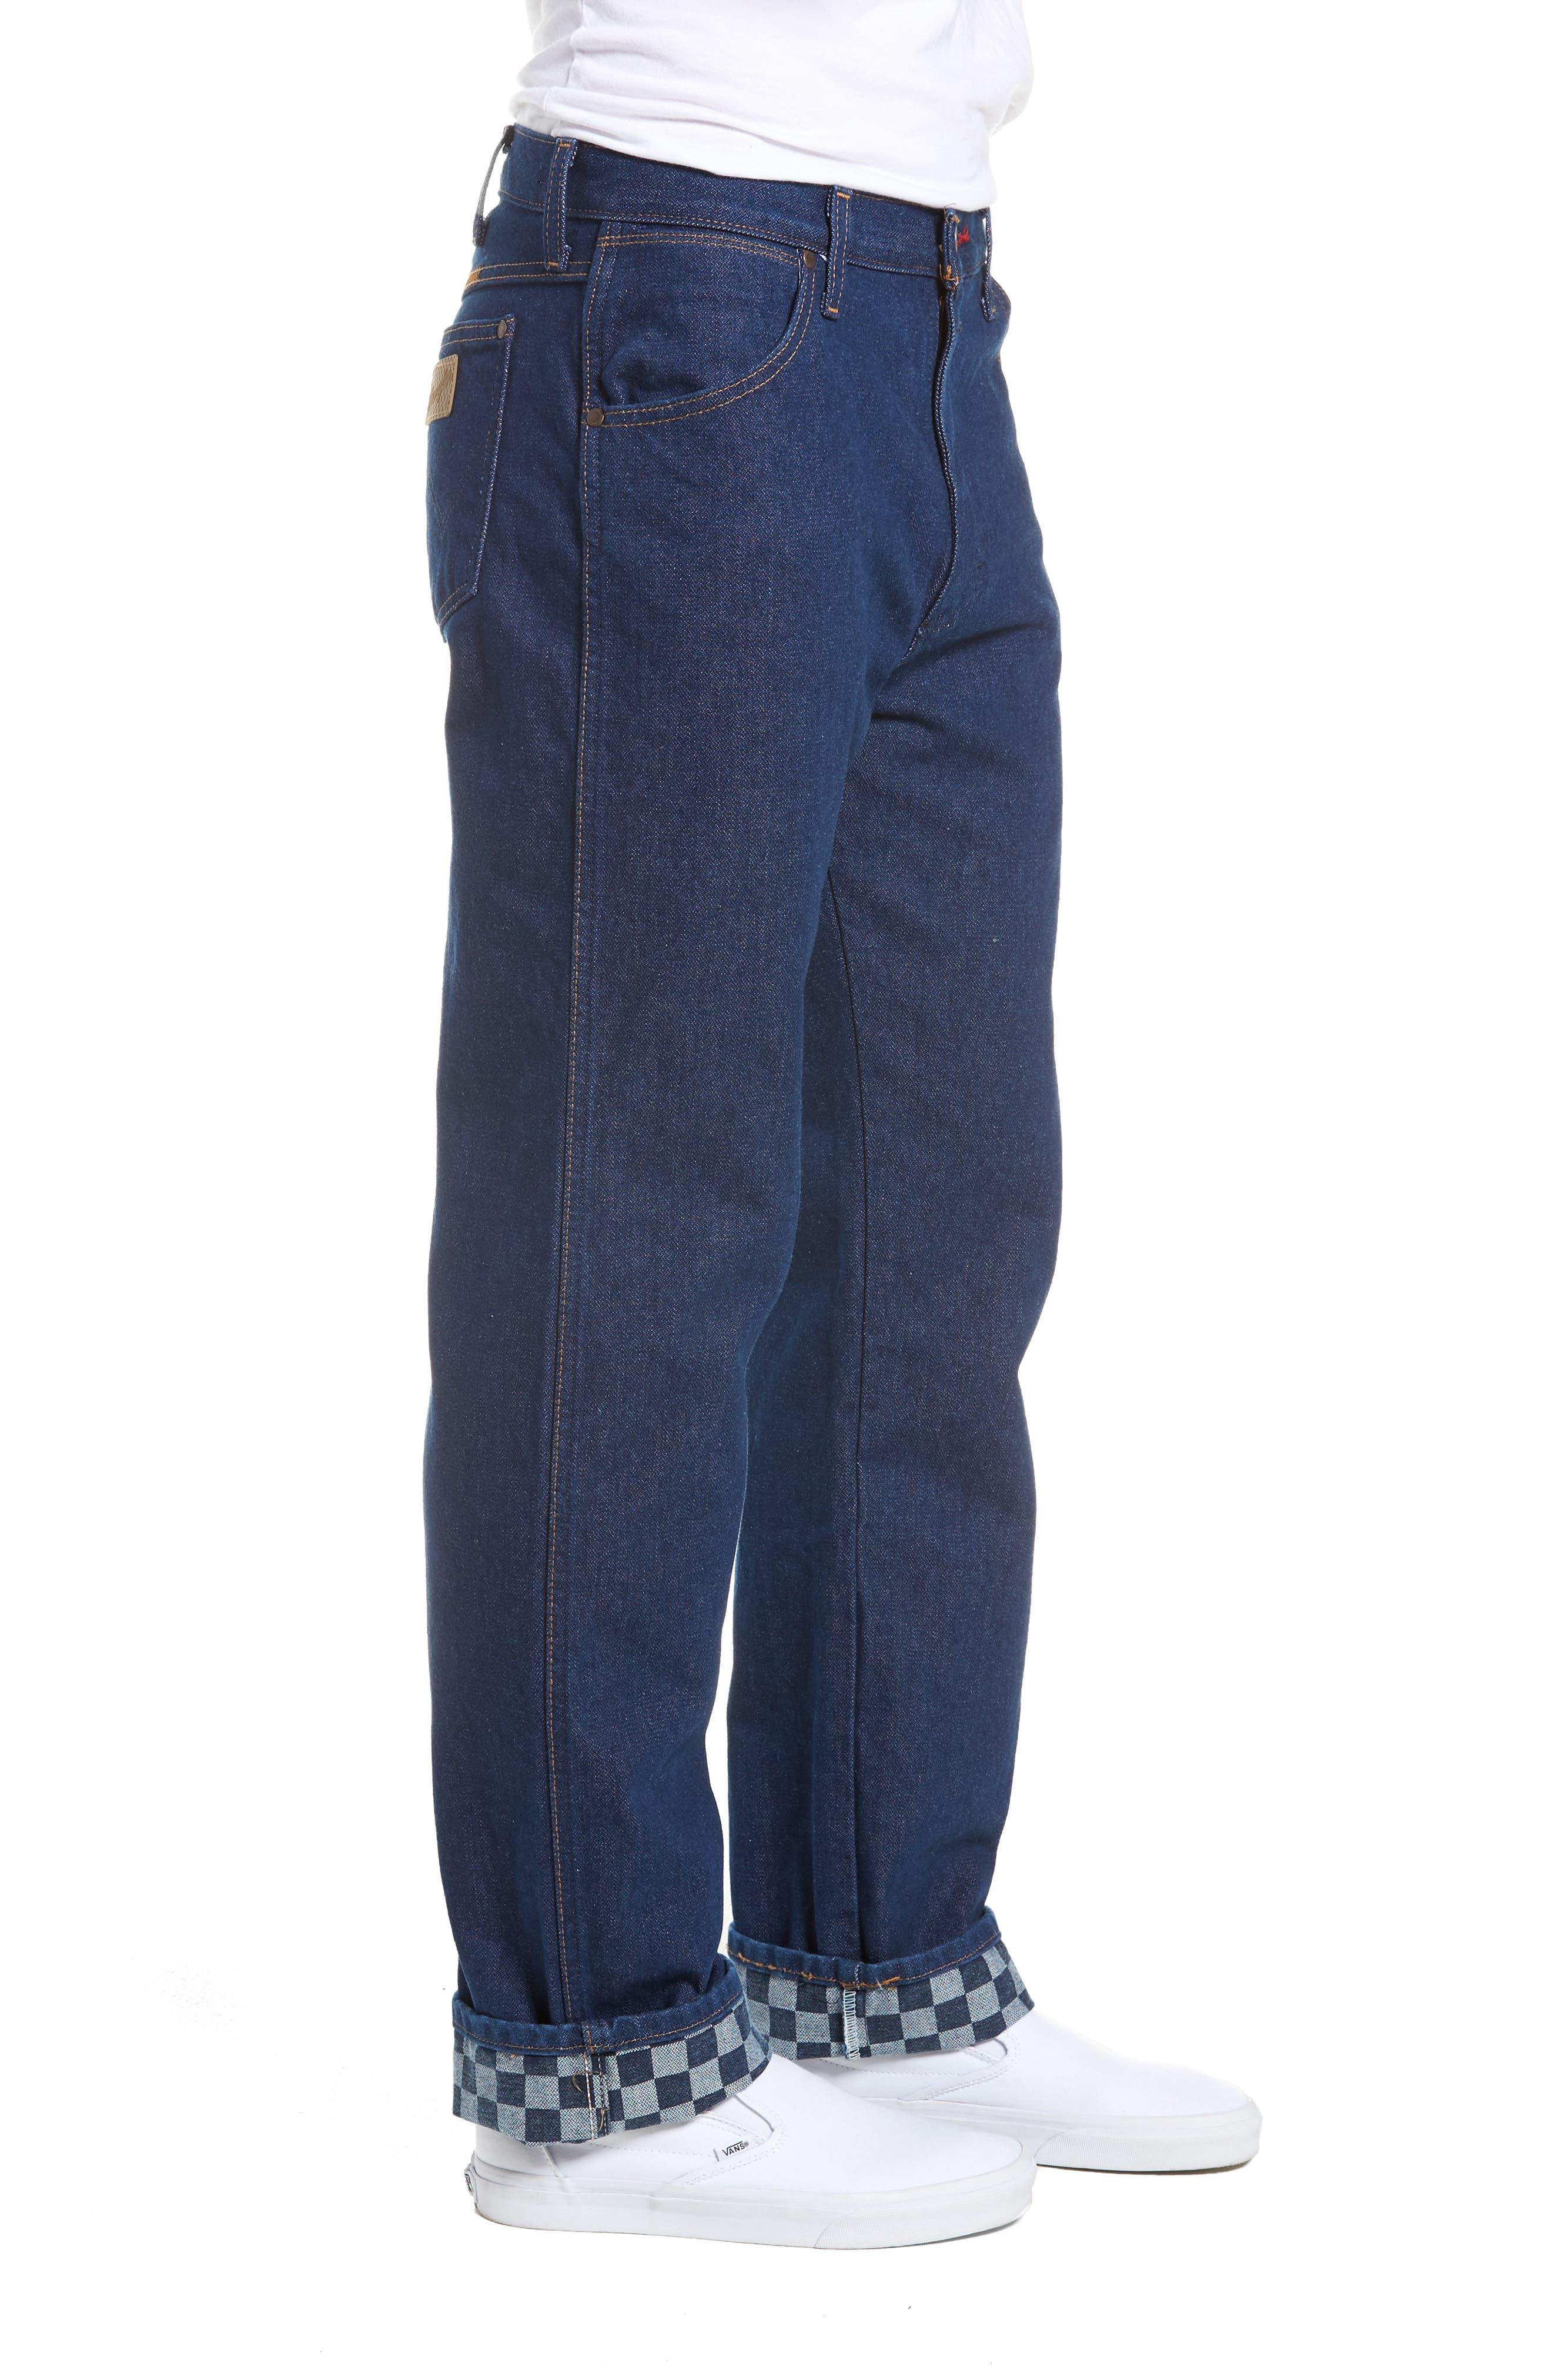 x Wrangler Straight Leg Jeans,                             Alternate thumbnail 3, color,                             PREWASH INDIGO